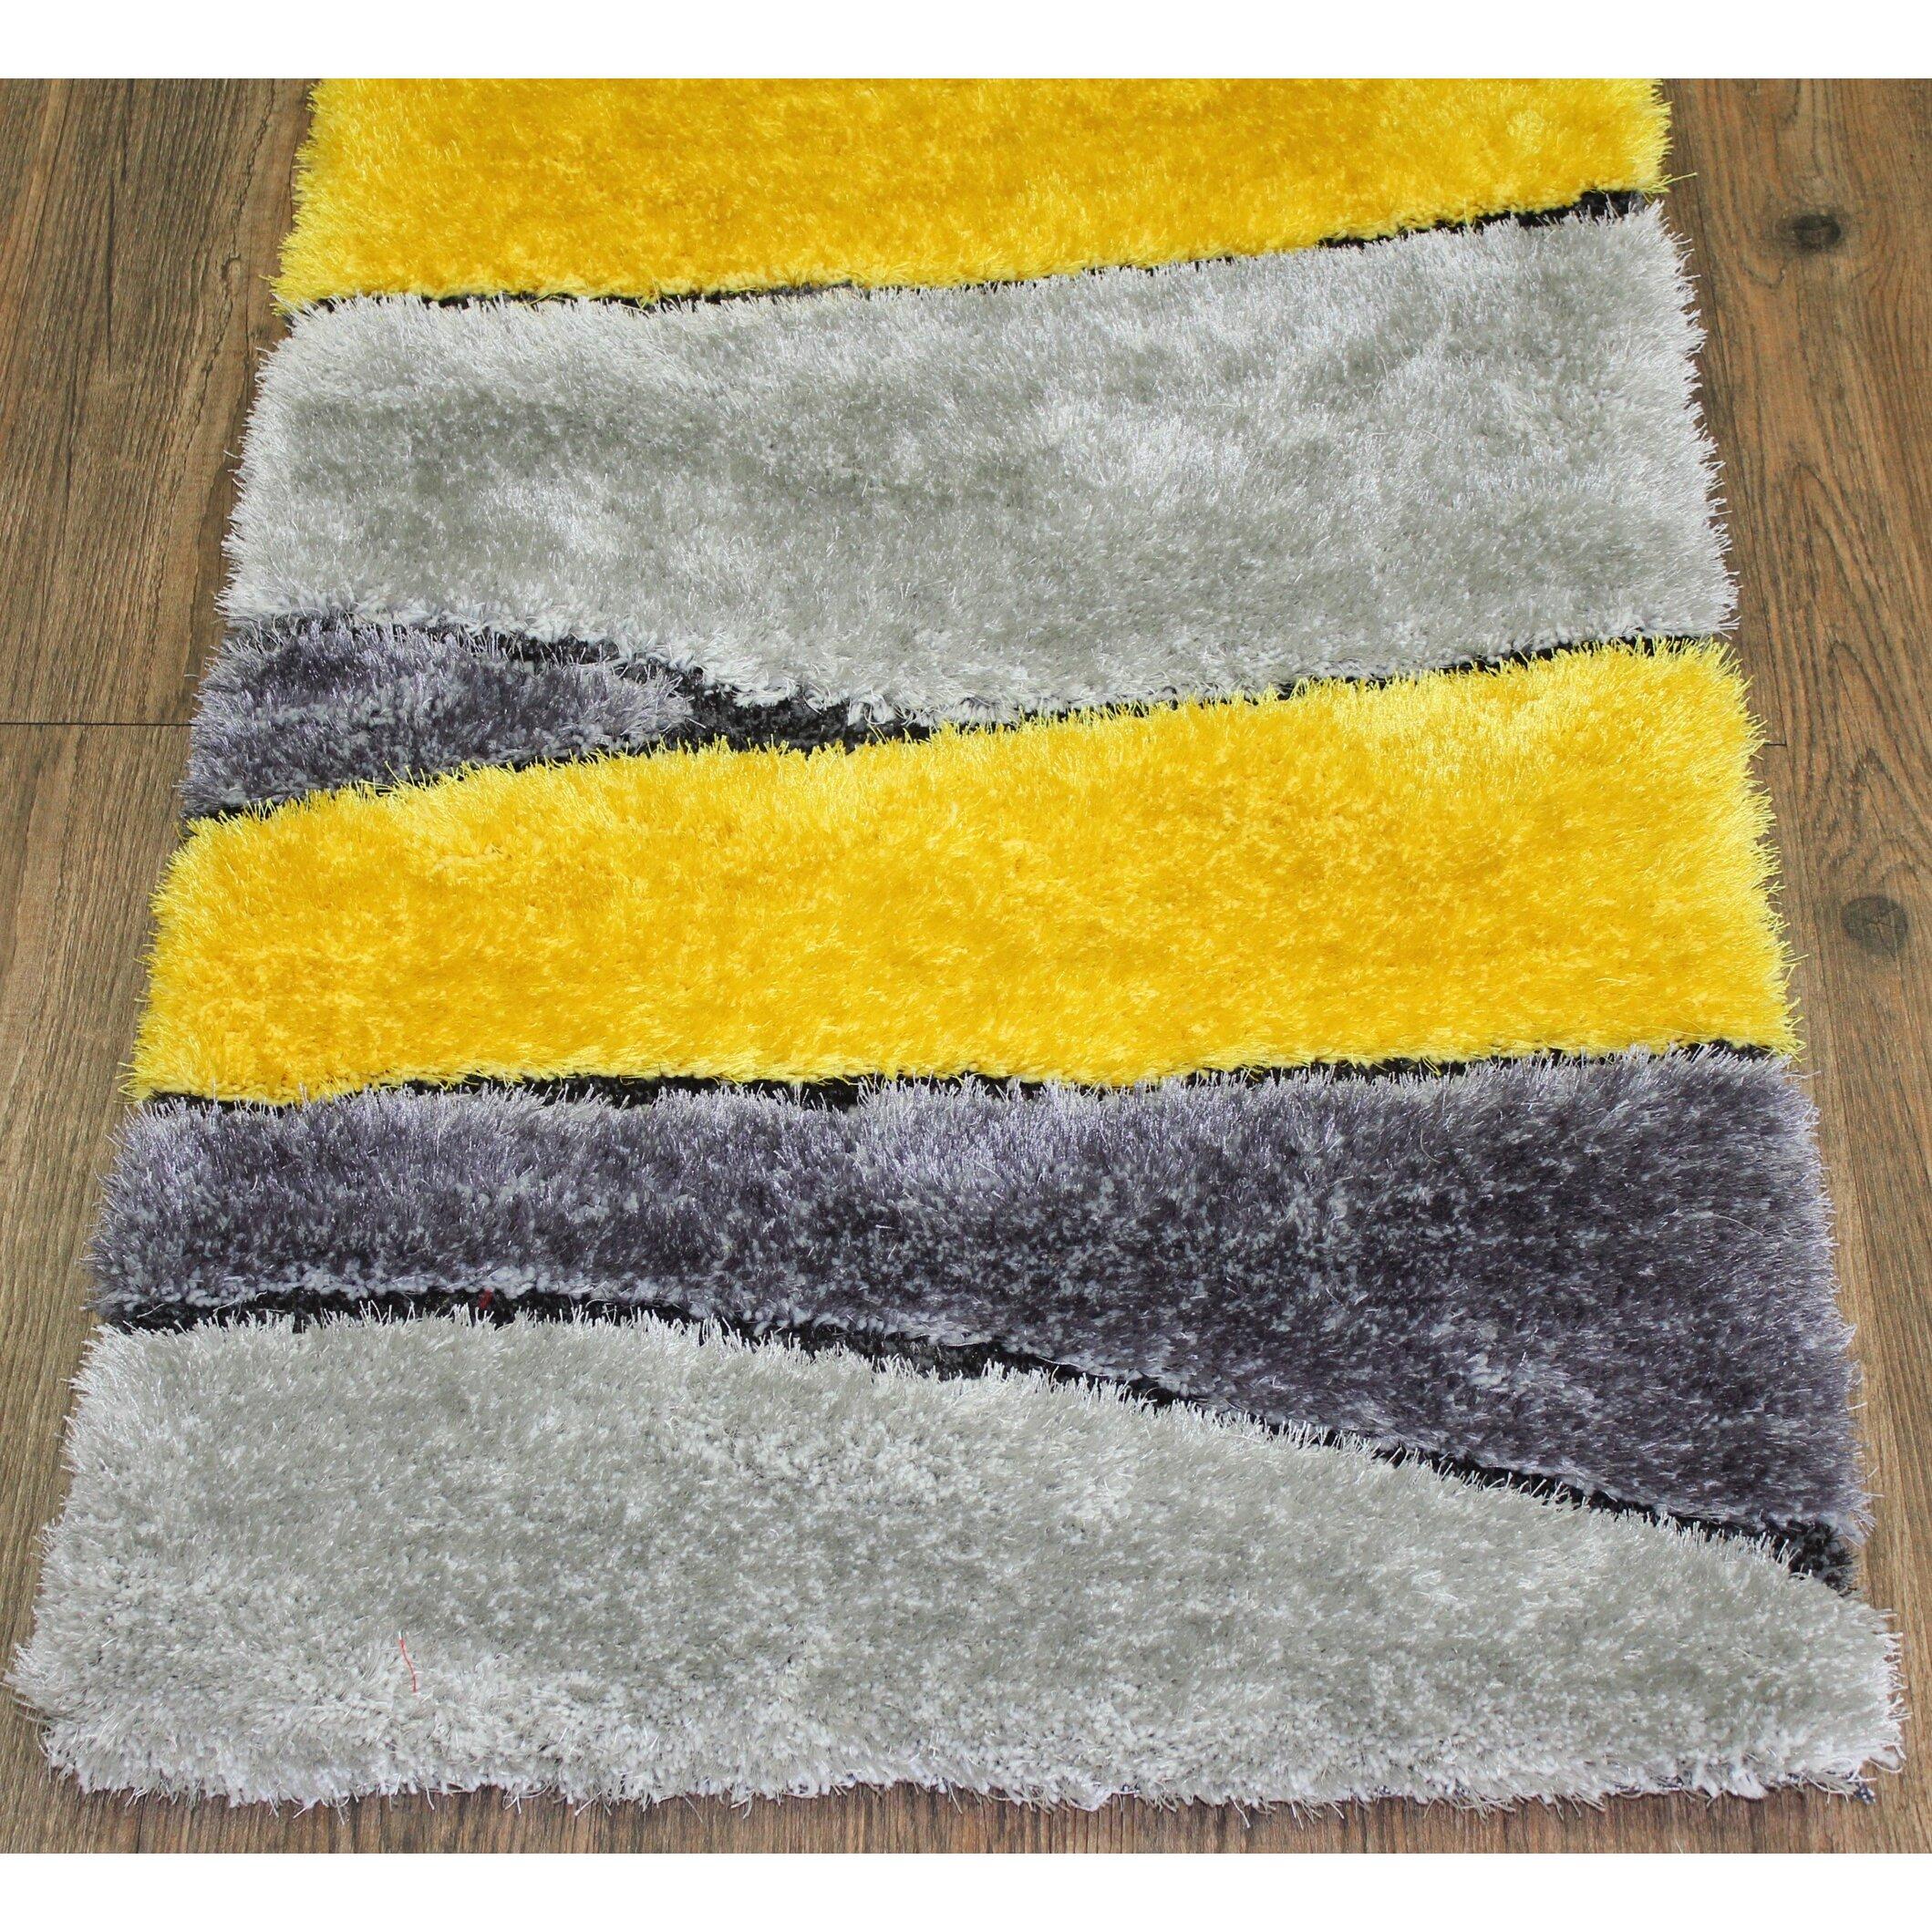 rug factory plus living shag hand tufted gray yellow area rug wayfair. Black Bedroom Furniture Sets. Home Design Ideas